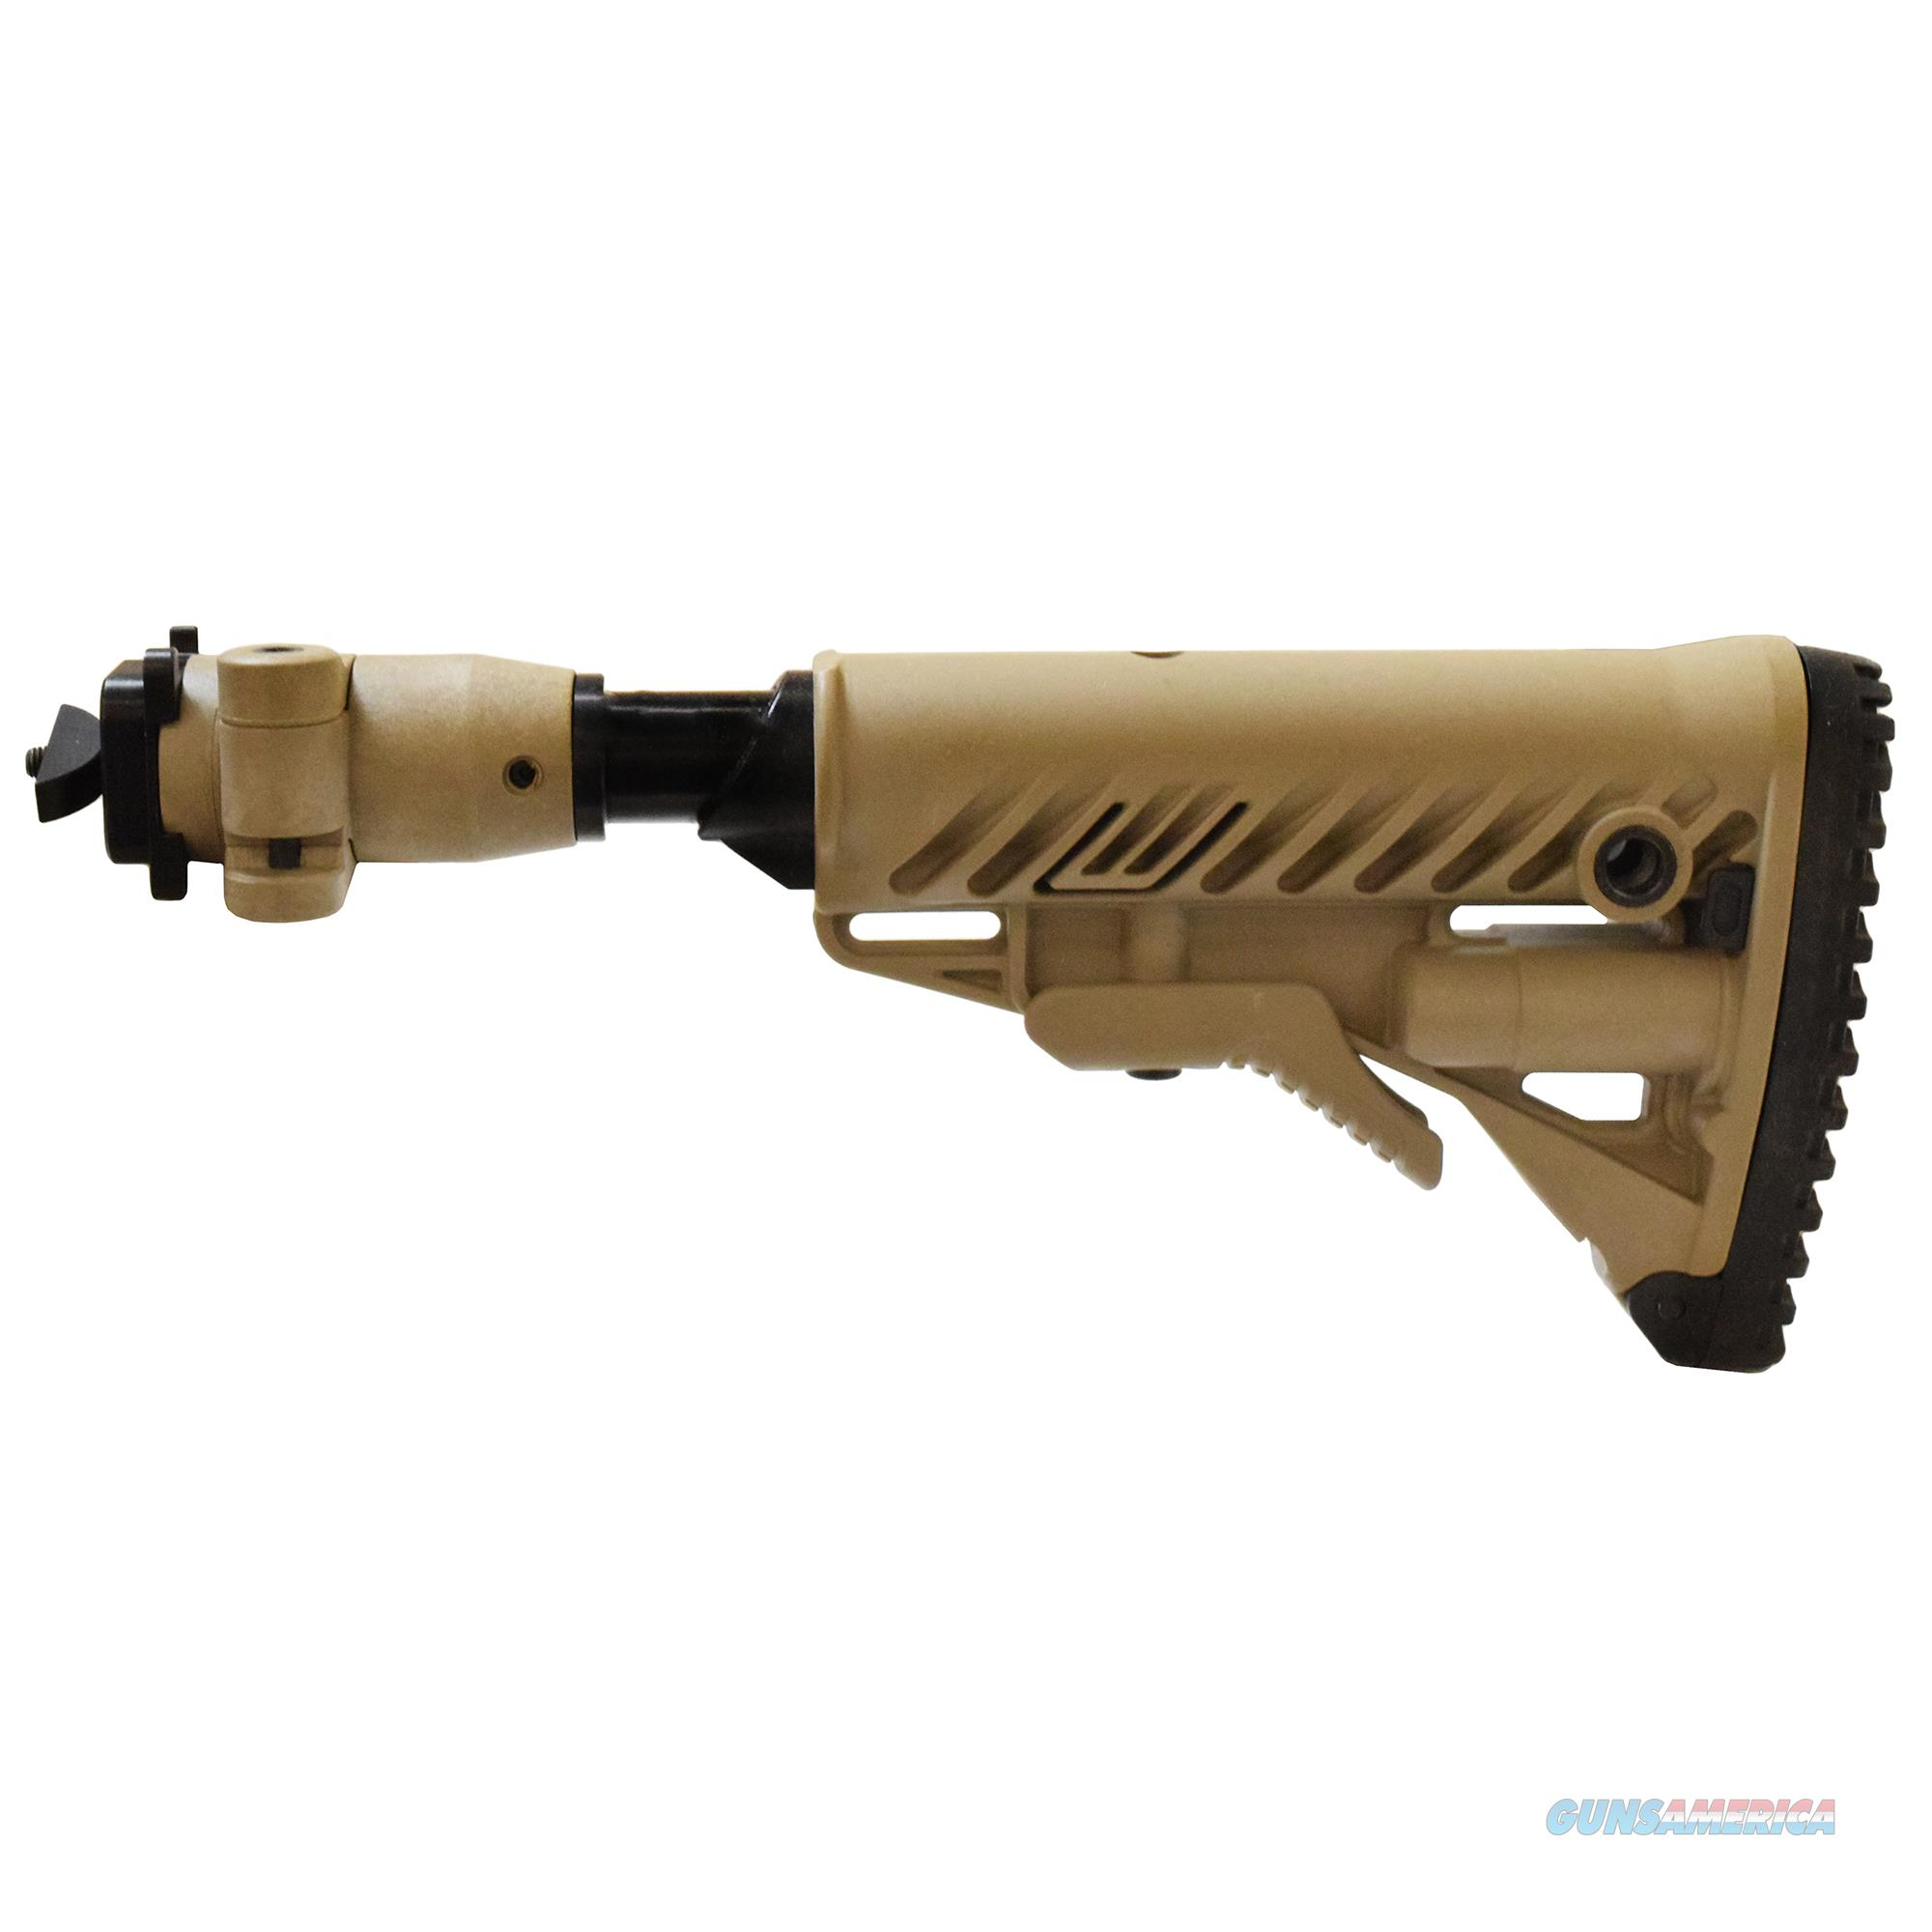 Mako Group Folding Collapsible Stock For Milled Ak Rifles M4-AKMILP SB-FDE  Non-Guns > Gunstocks, Grips & Wood